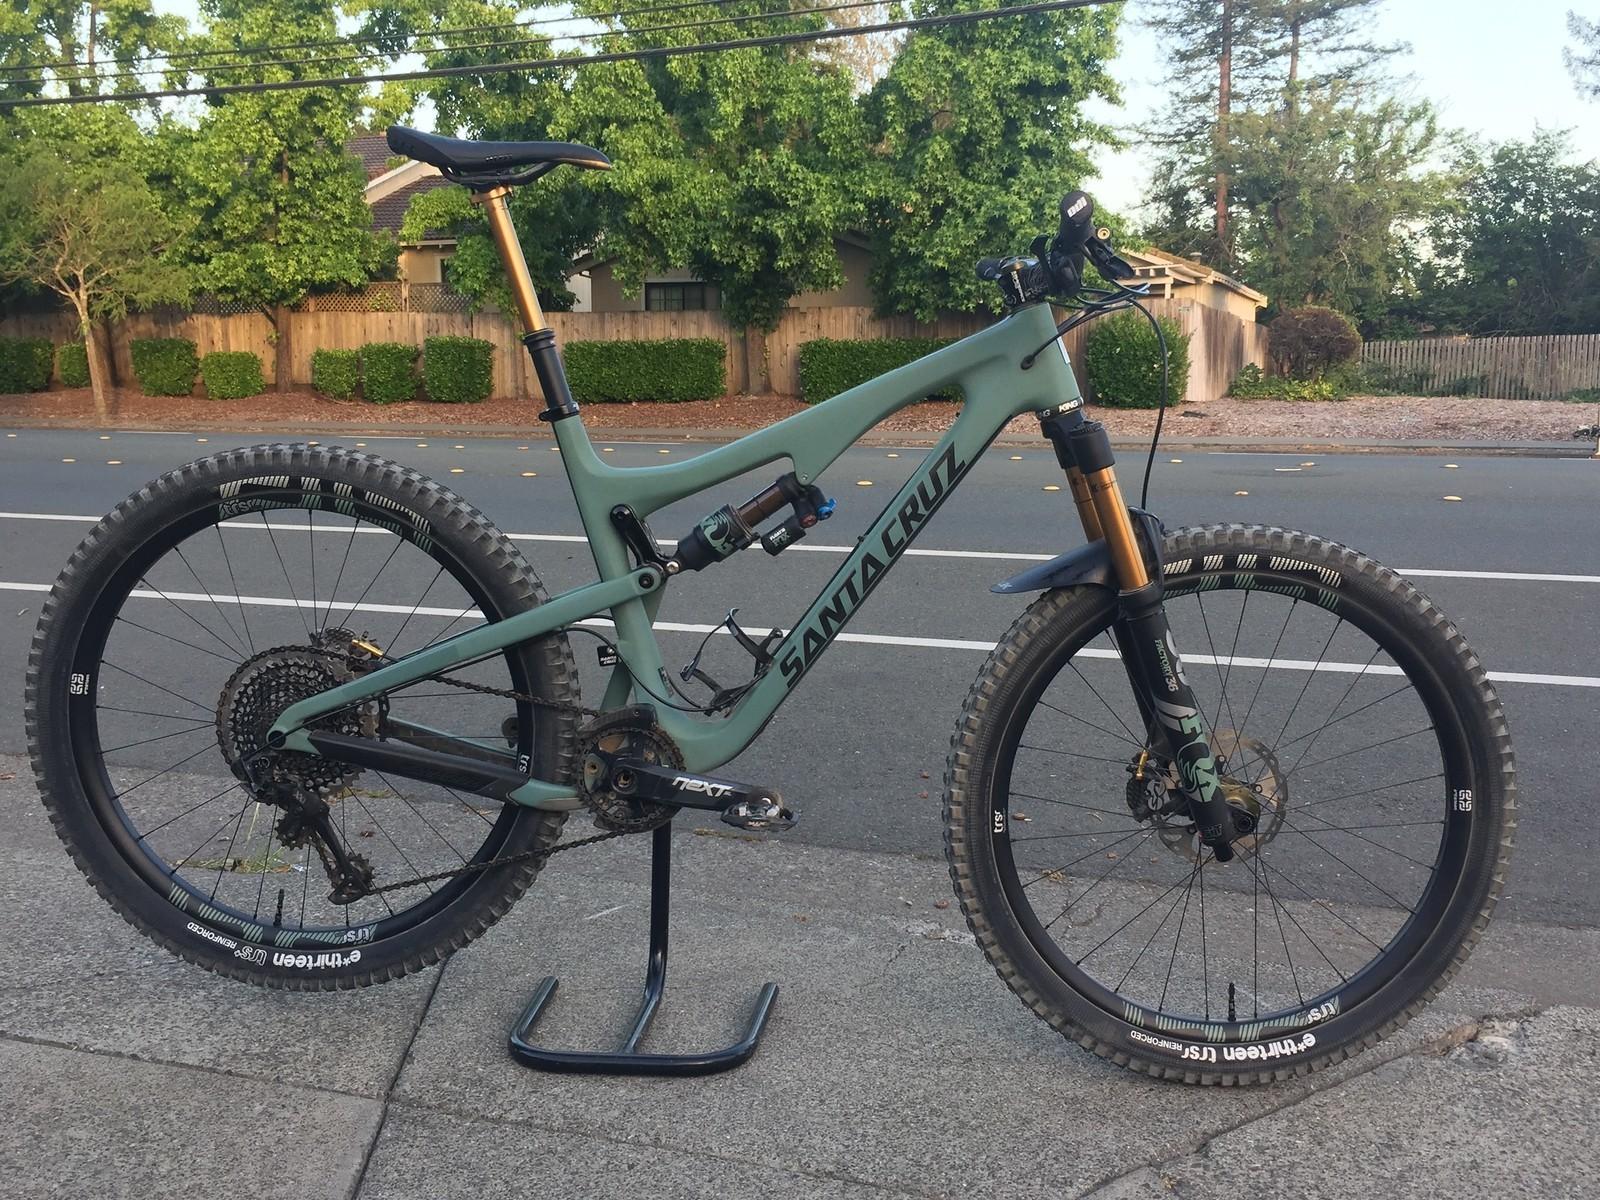 856618db22f Chris King Santa Cruz 5010 - Seven Super Sexy Santa Cruz Solos - Mountain  Biking Pictures - Vital MTB